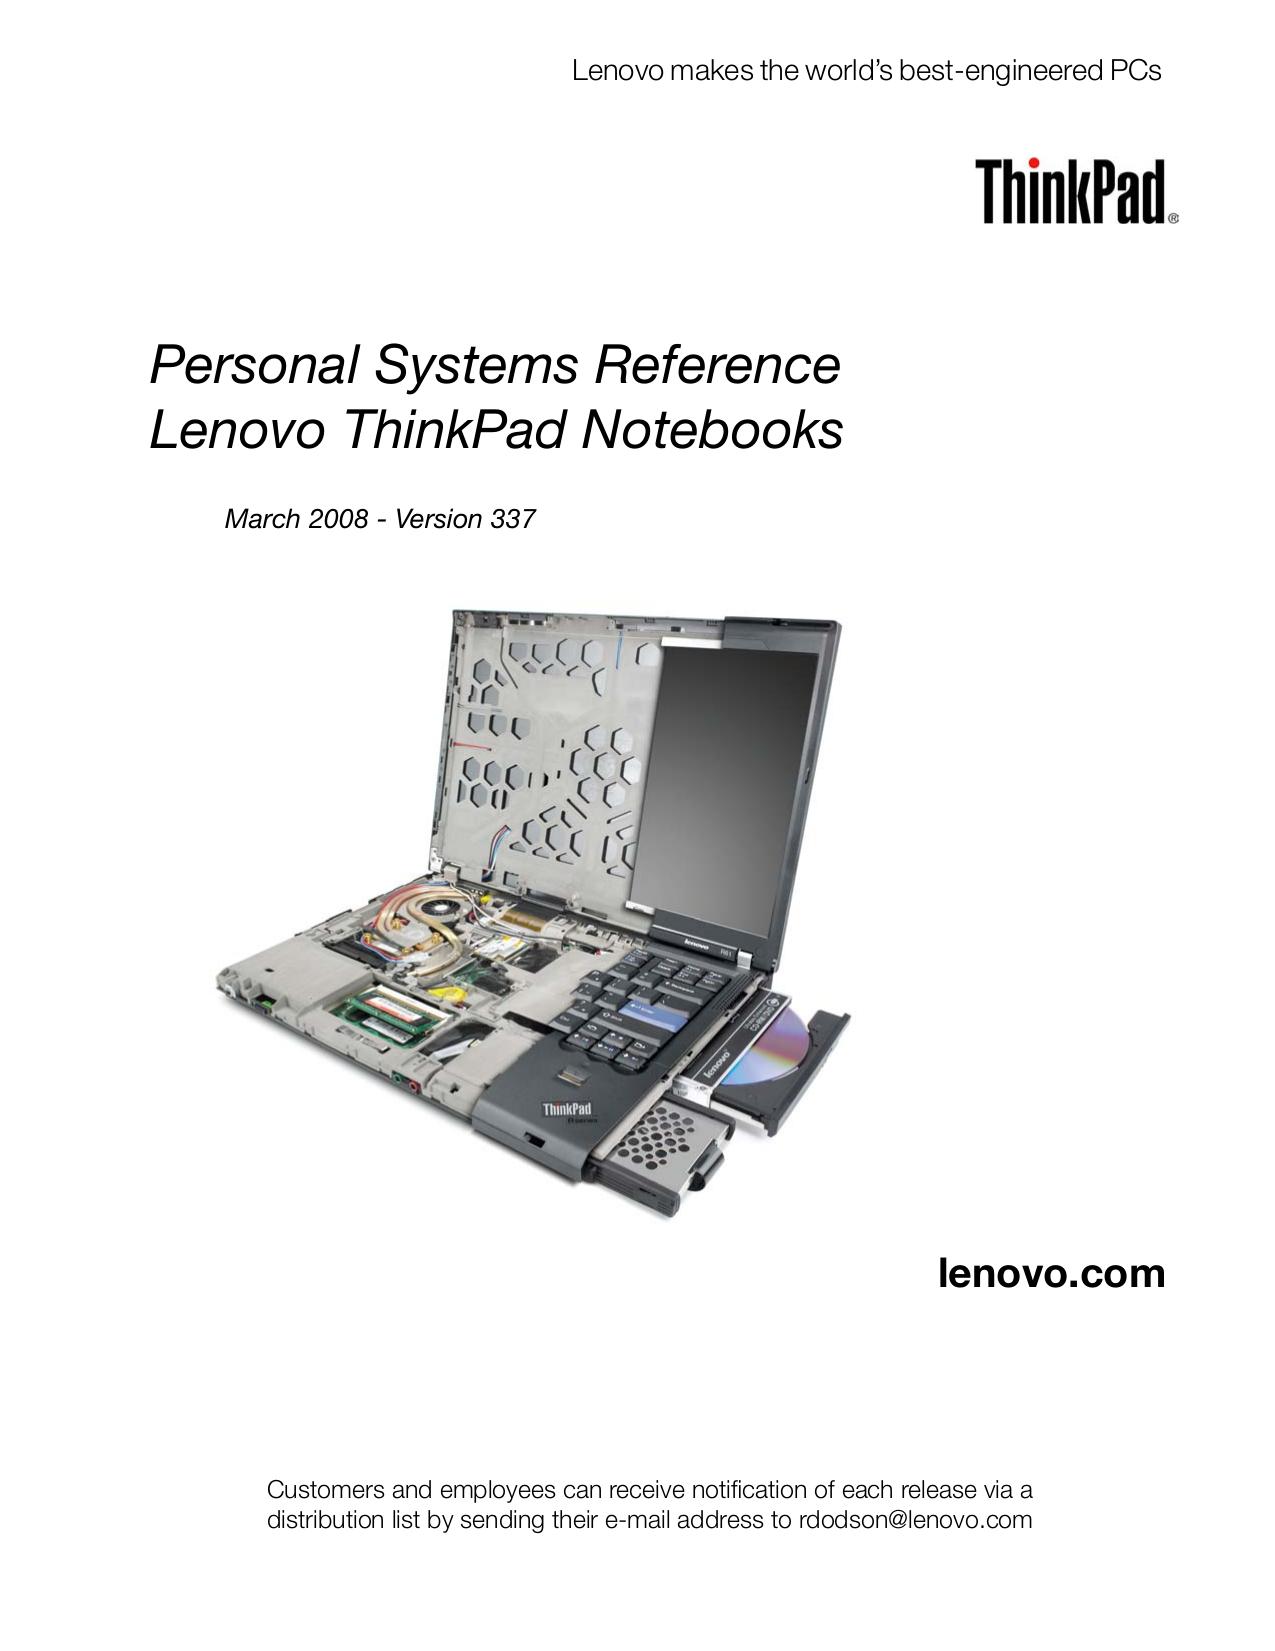 download free pdf for lenovo thinkpad t61 7659 laptop manual rh umlib com lenovo thinkpad t61p service manual lenovo thinkpad t61 user manual download